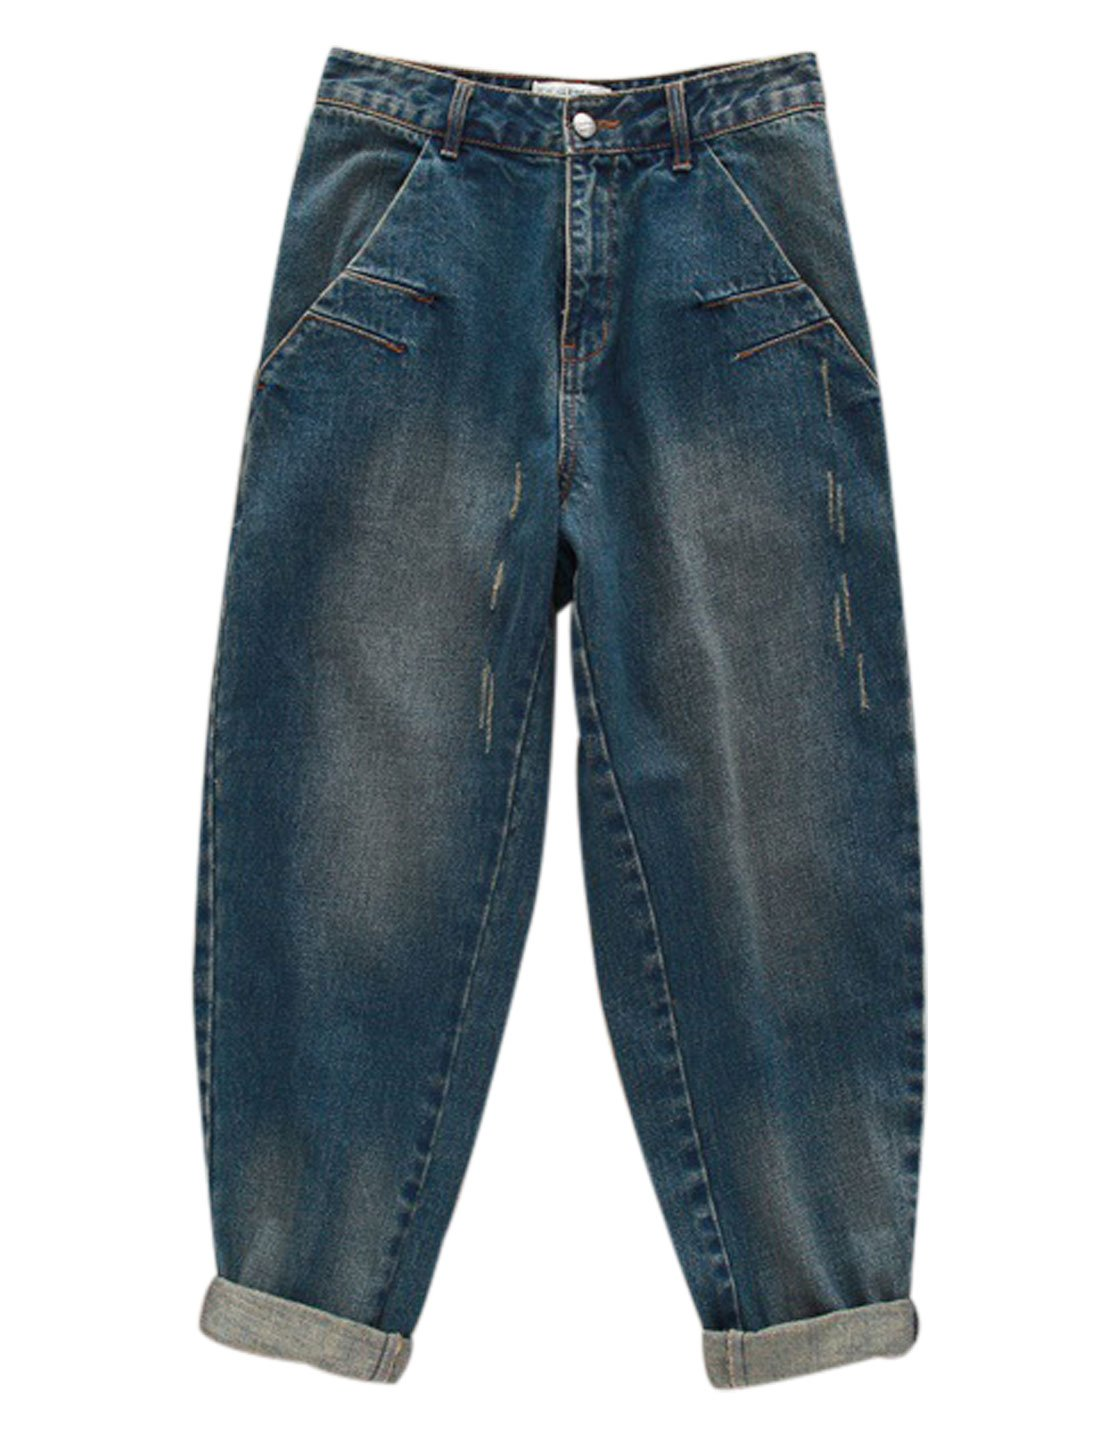 Yeokou Women's Casual Loose Distressed Baggy Harem Denim Jeans Cropped Pants (Large, Dark Blue) by Yeokou (Image #5)